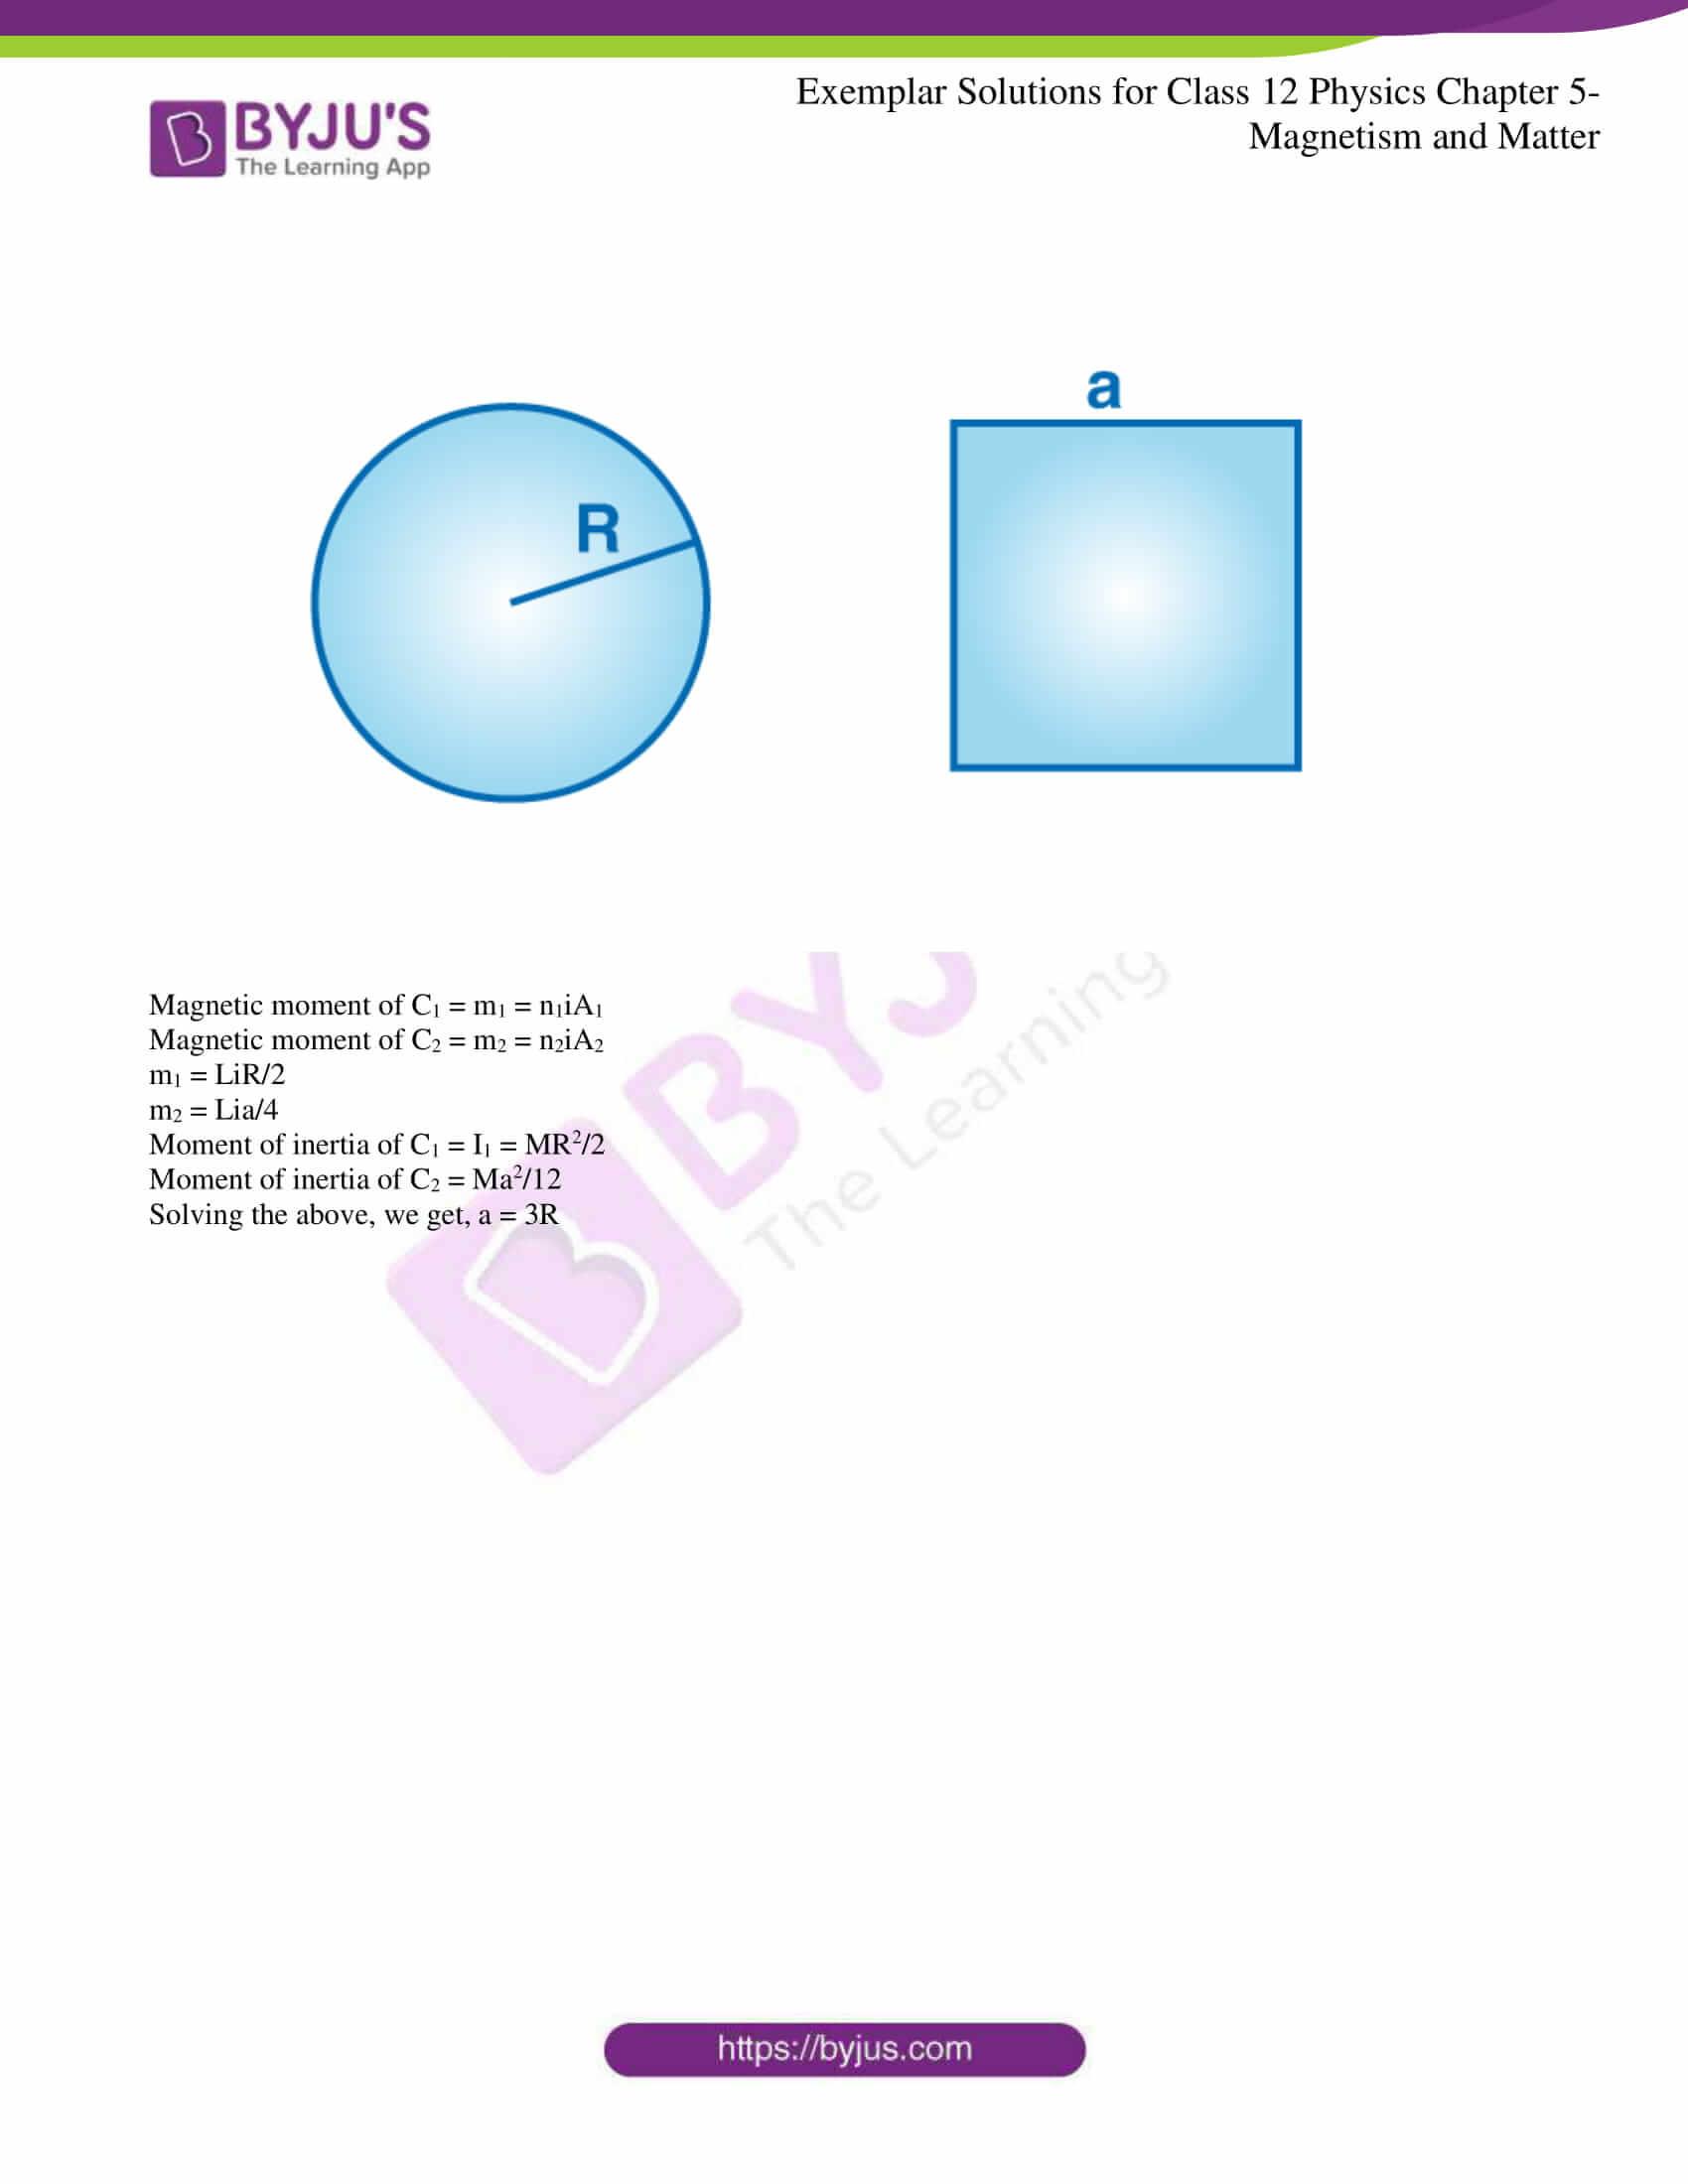 ncert exemplar solutions for class 12 physics chapter 5 11